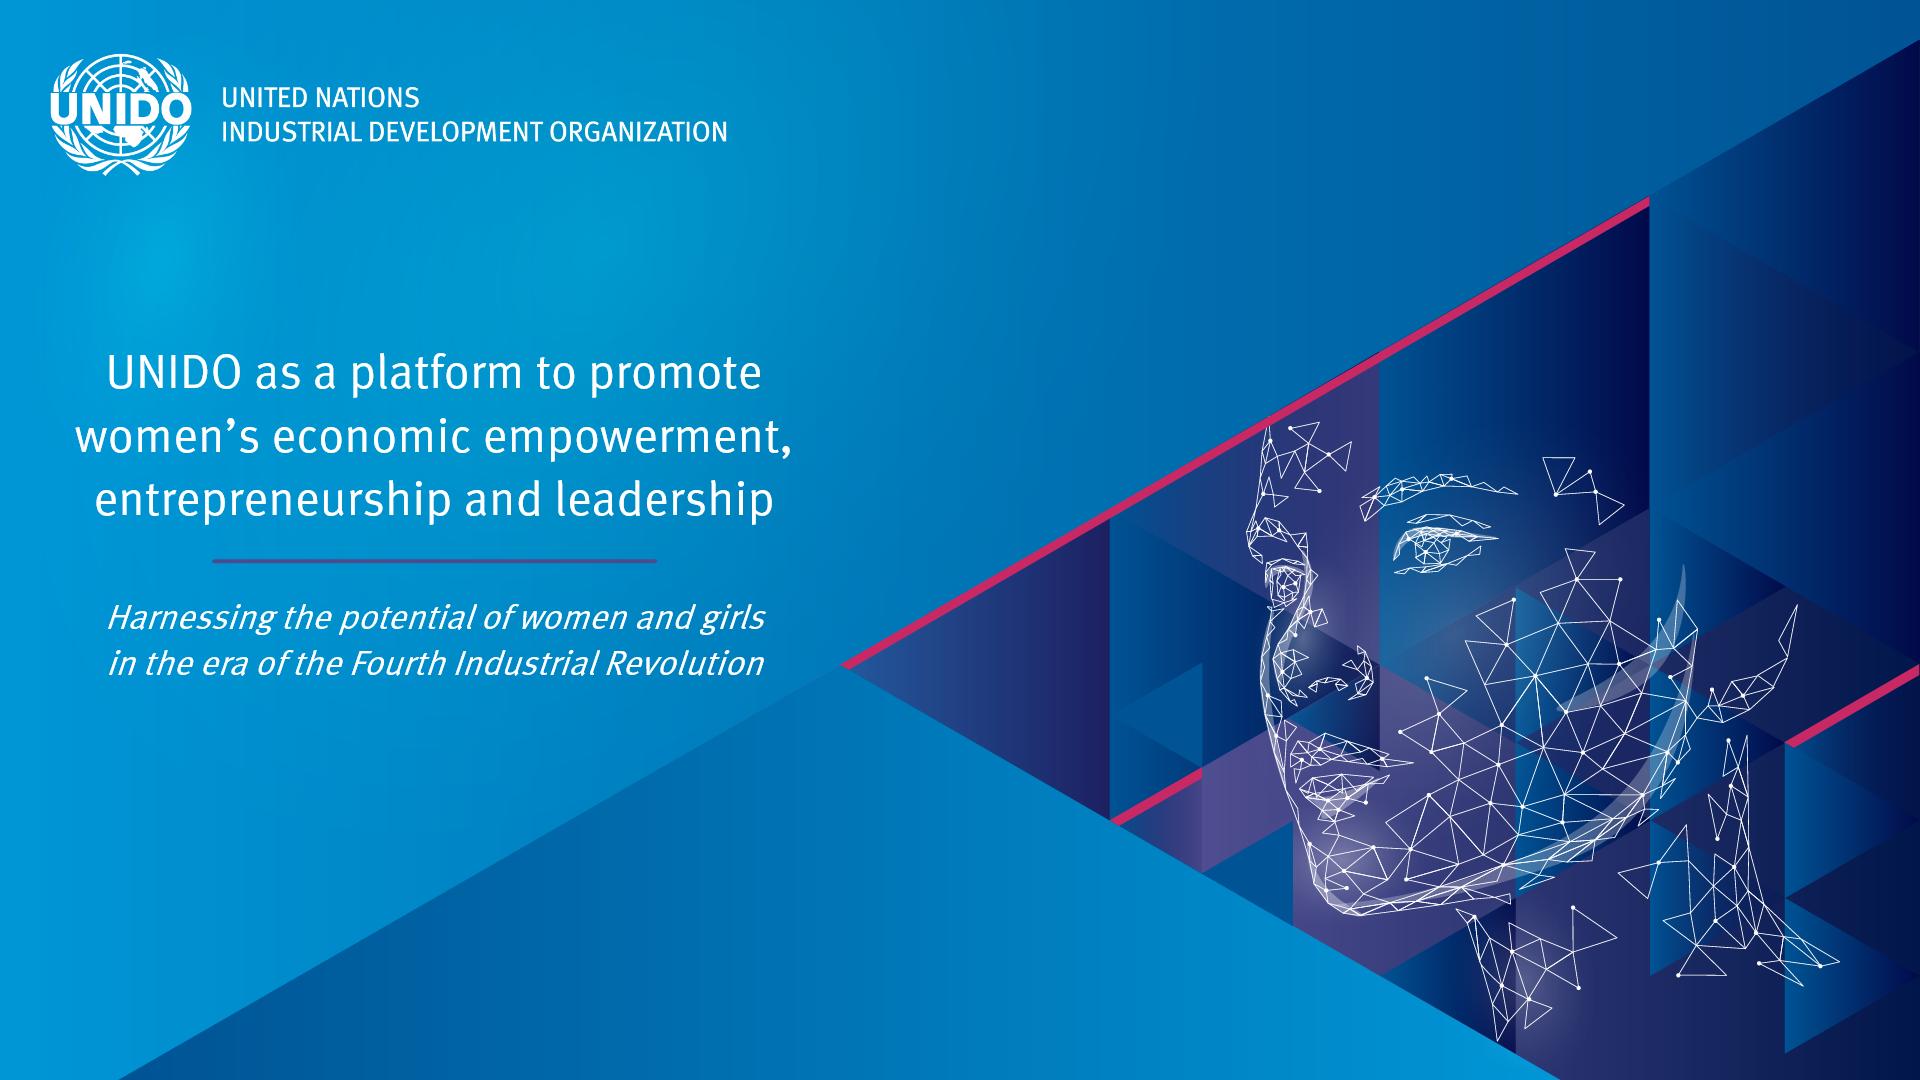 UNIDO as a platform to promote women's economic empowerment, entrepreneurship and leadership